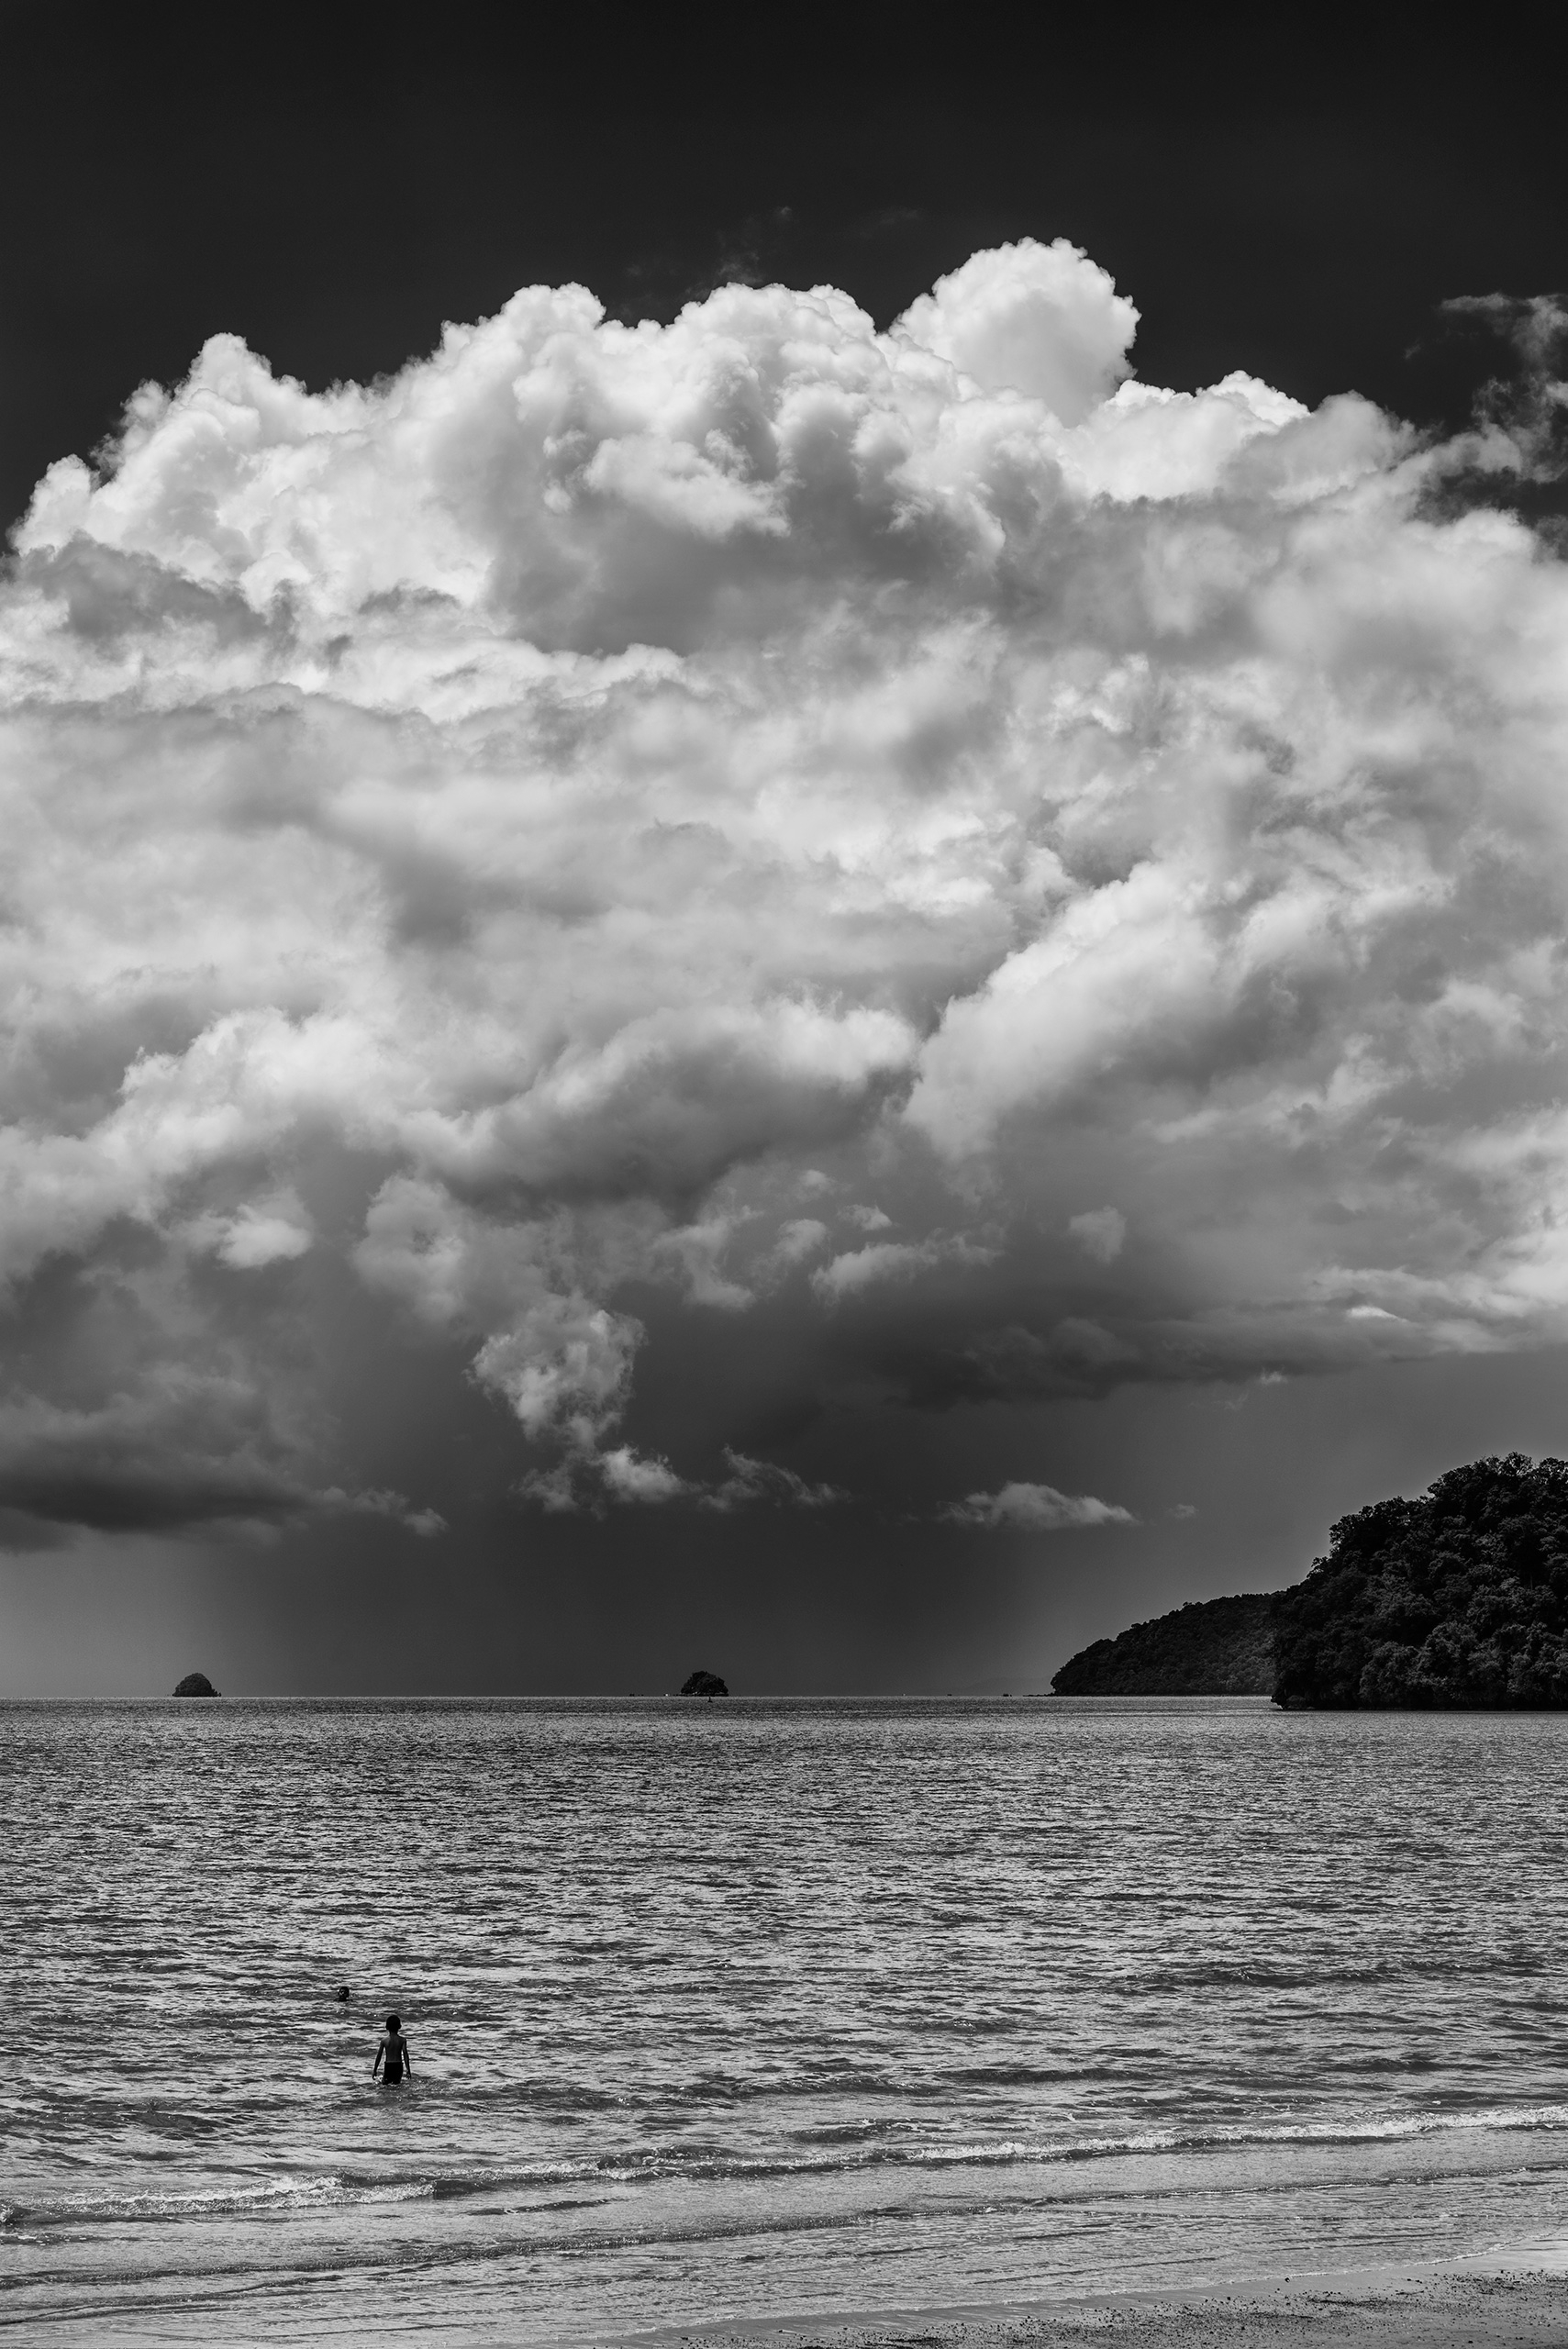 boys awaiting storm - ocean, monsoon - christofkessemeier | ello